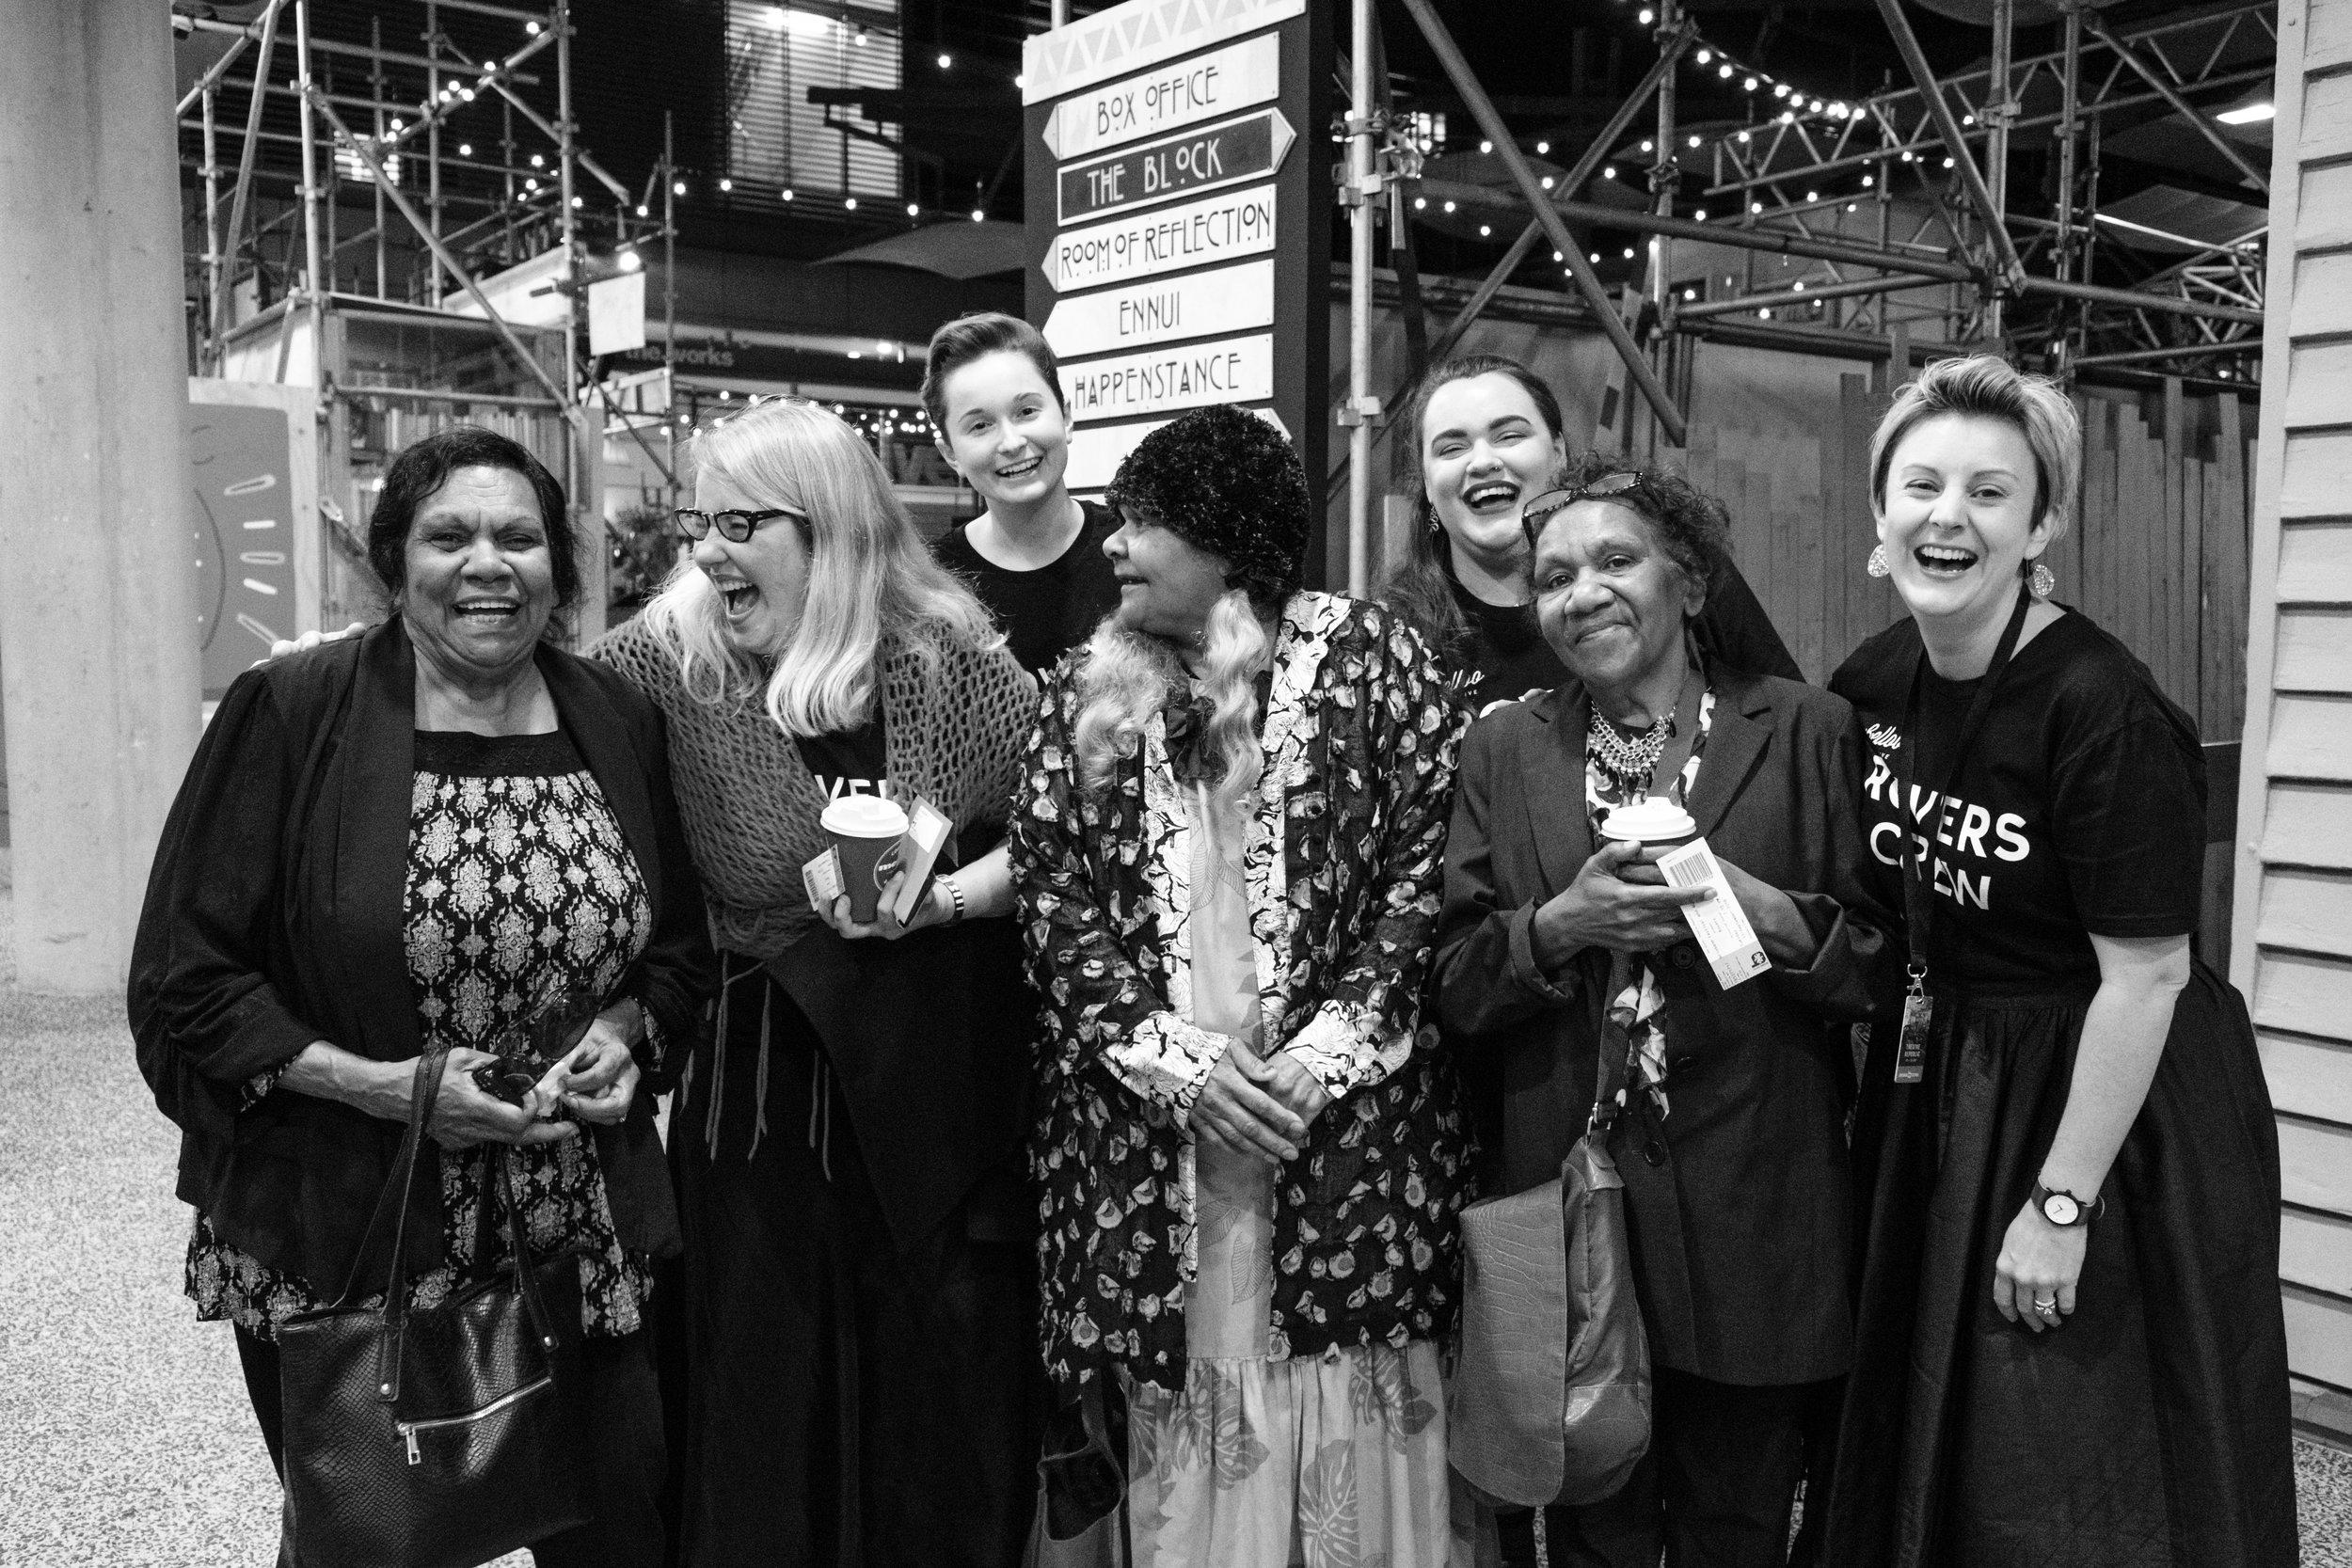 Rovers (2018) Community Engagement Project, Brisbane Festival. Pictured: Aunty Melita Orcher, Kathryn Kelly, Cinnamon Watson, Aunty Estelle, Emily Coleman,  Aunty Berenice and Danielle Shankey.